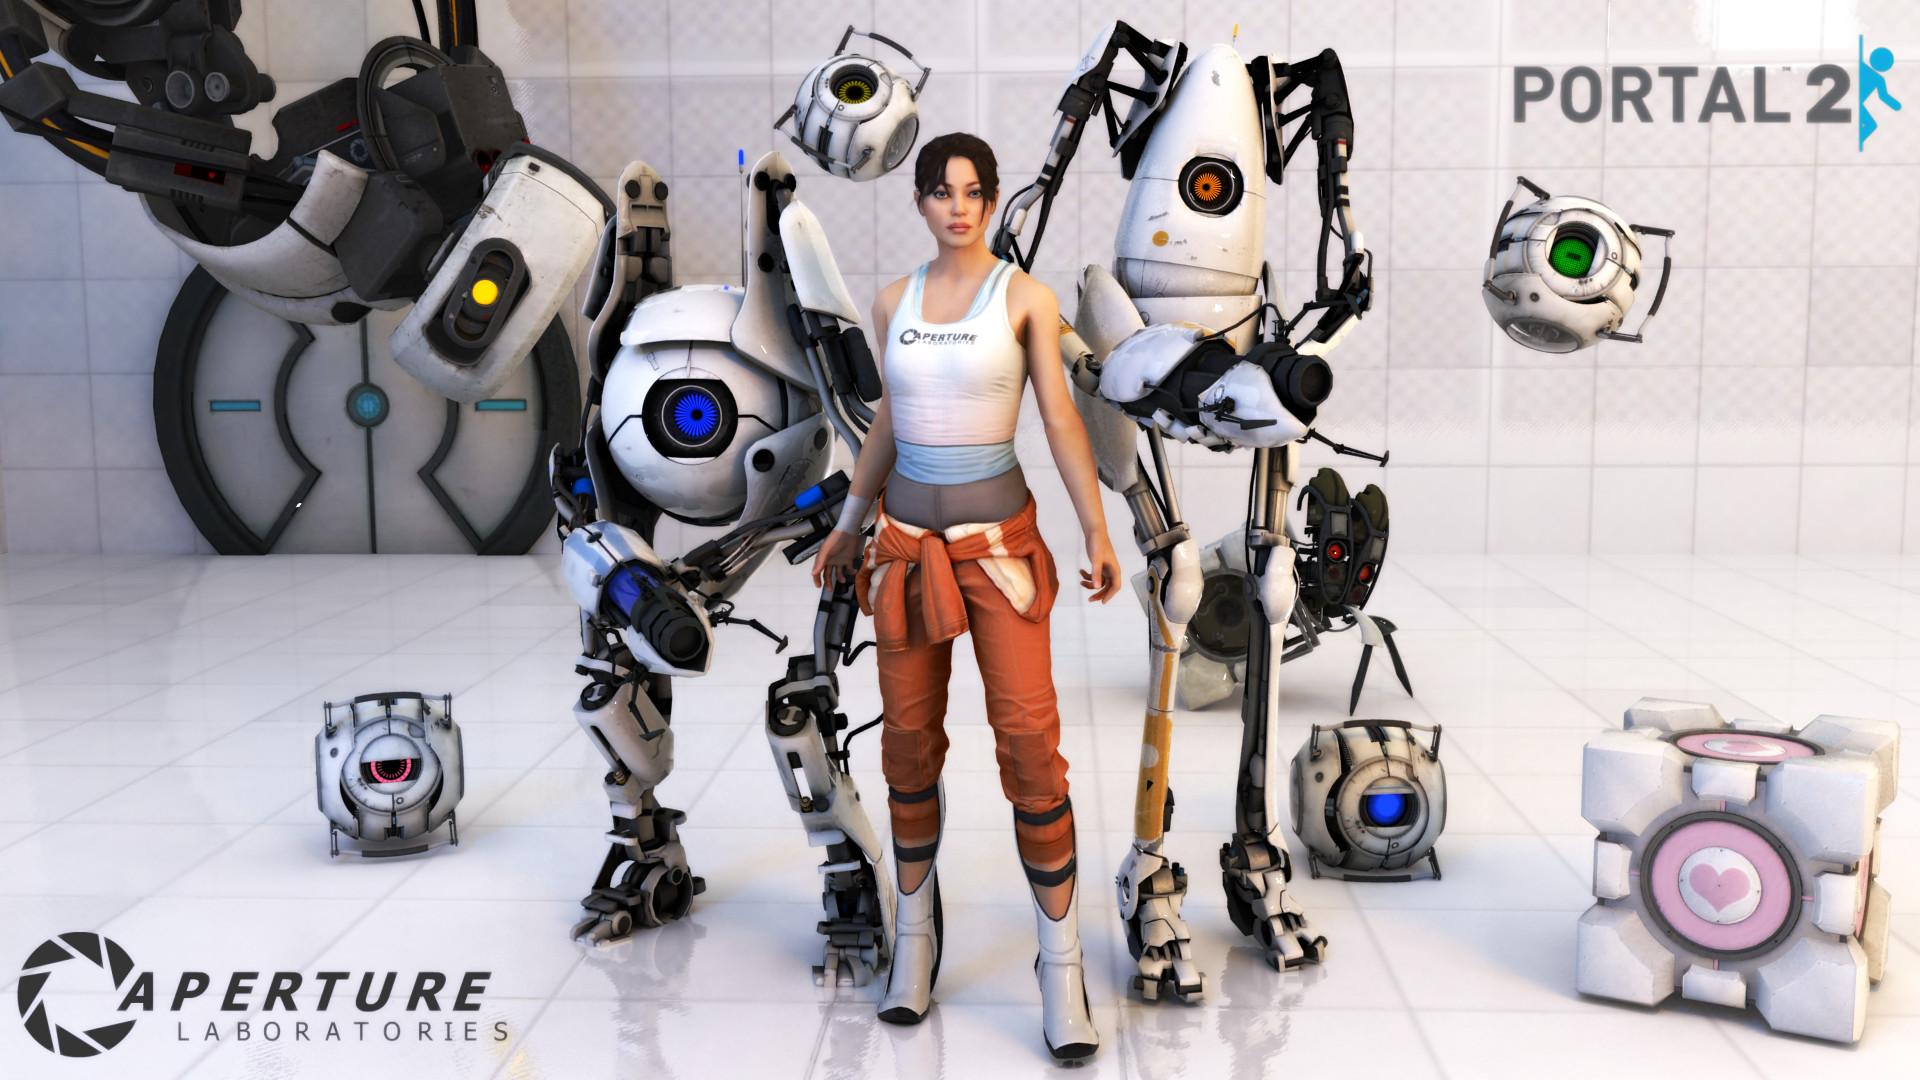 Video Game – Portal 2 Wheatley (Portal) Chell (Portal) Portal (Video